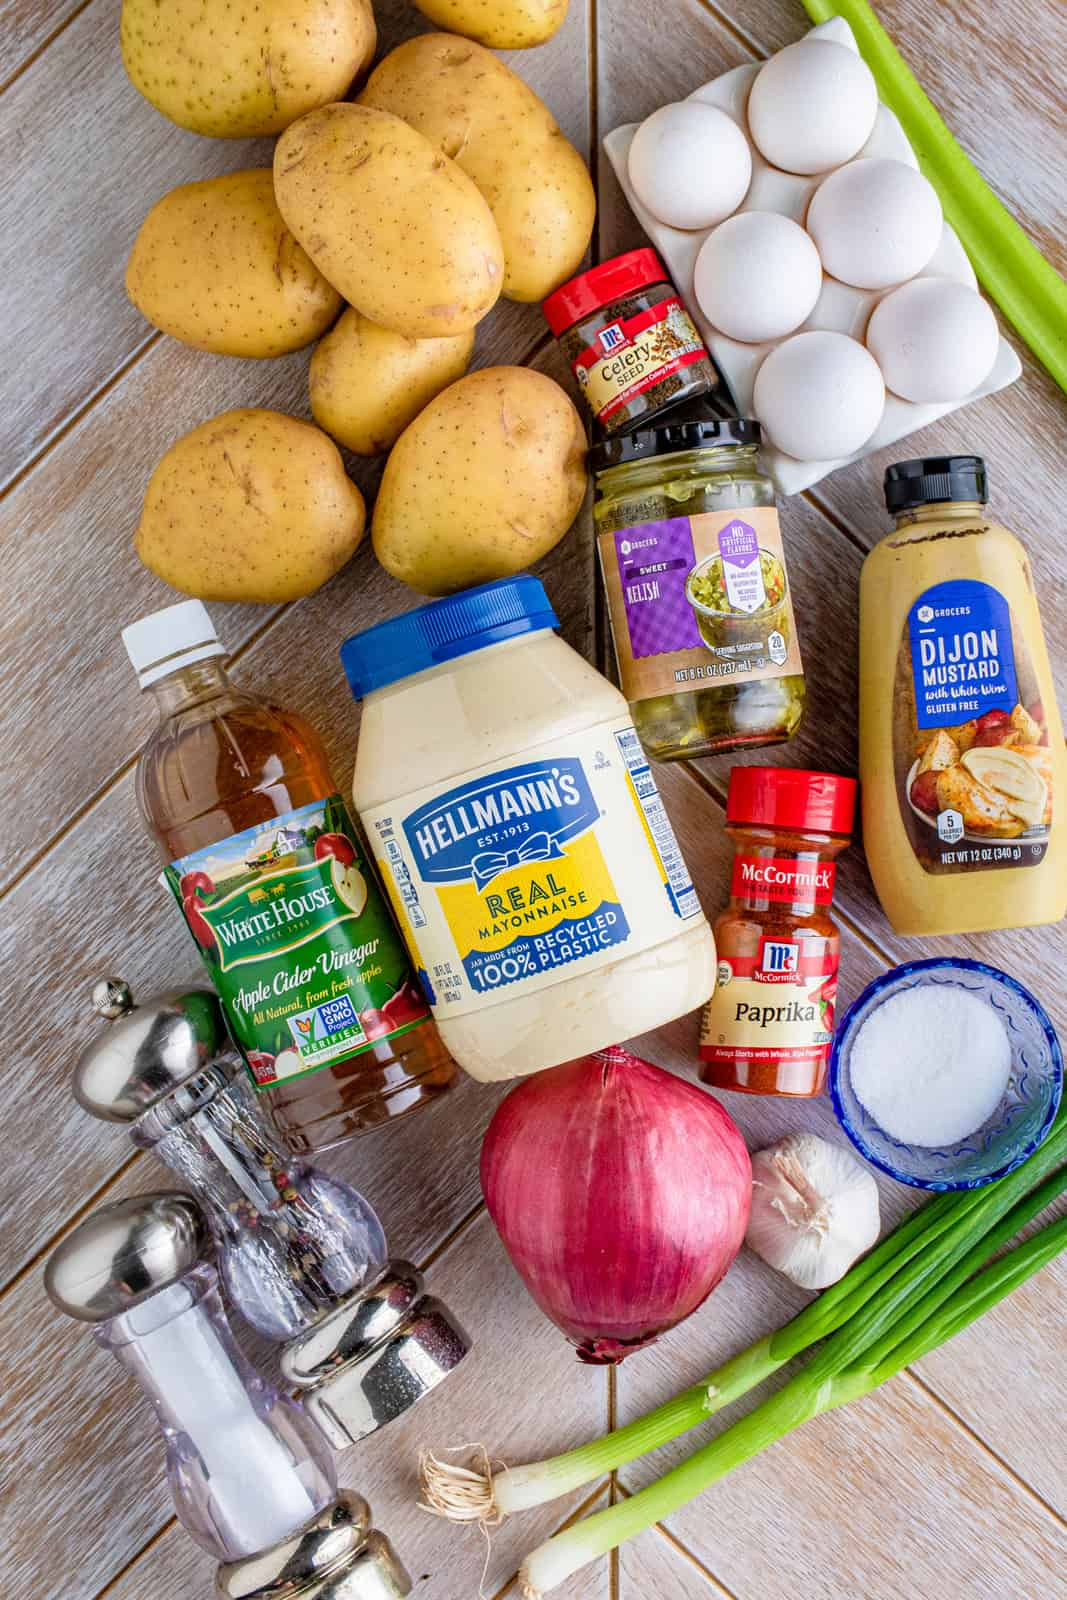 Ingredients needed to make Potato Salad